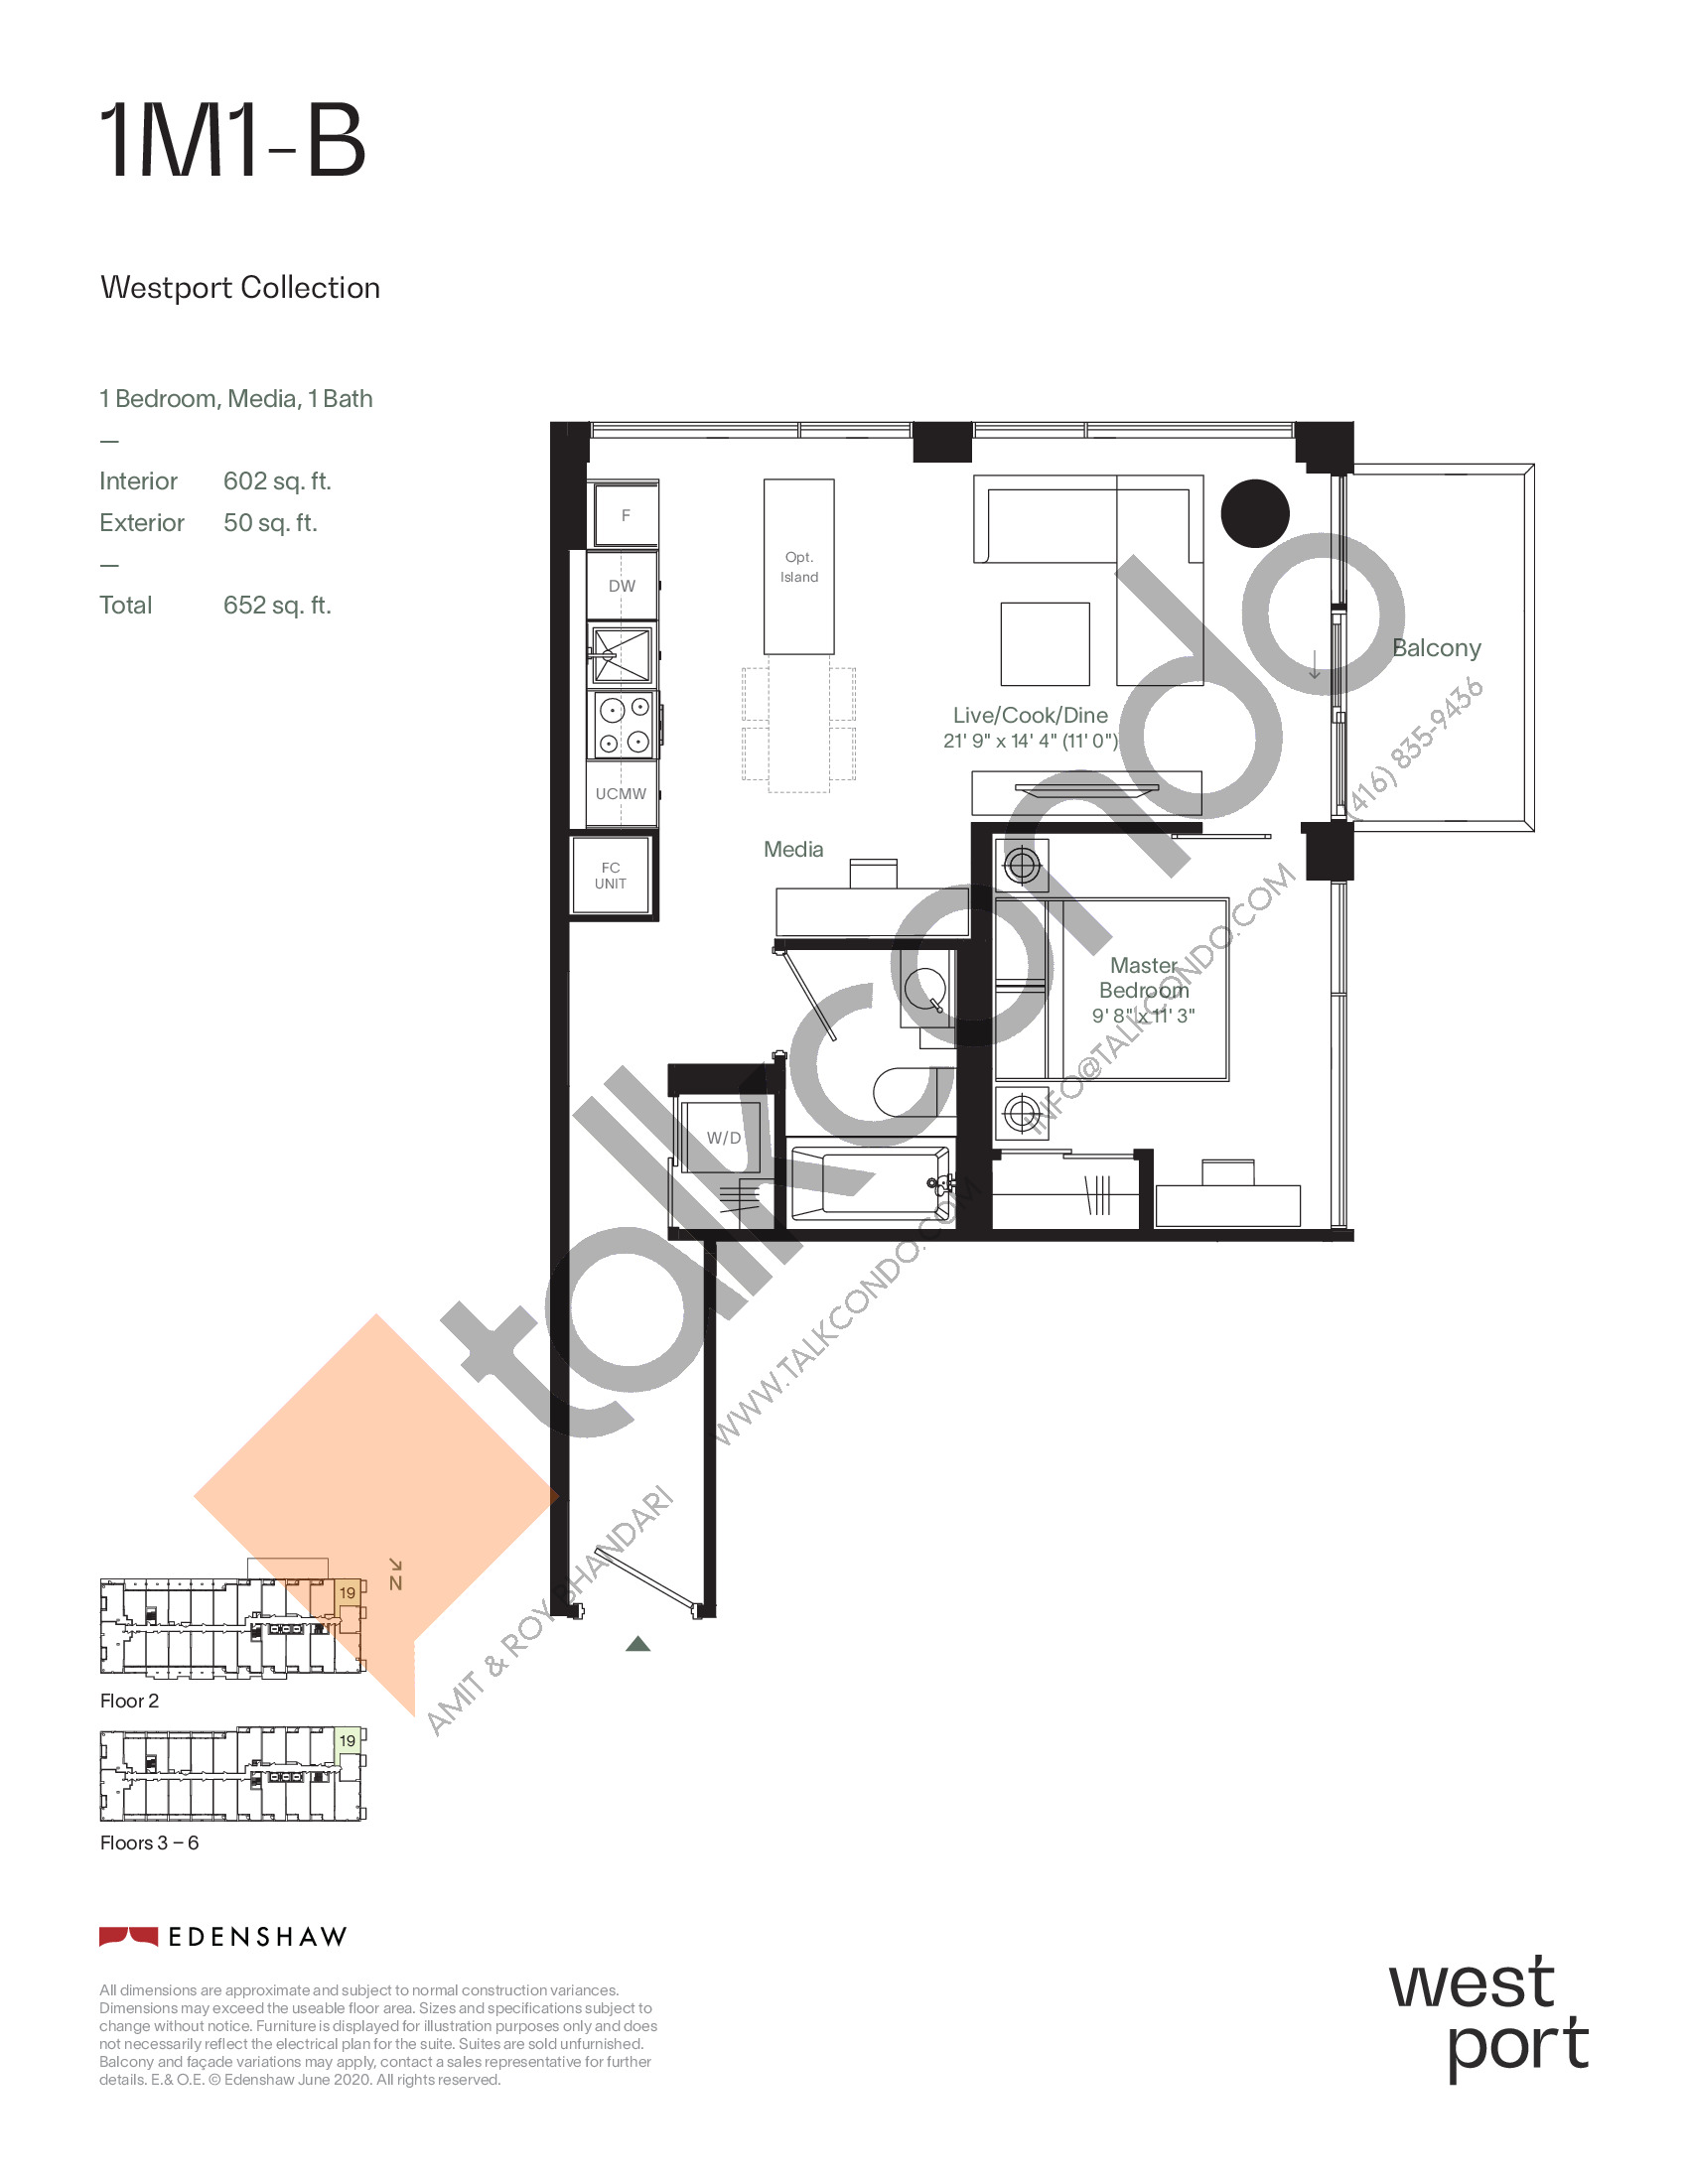 1M1-B - Westport Collection Floor Plan at Westport Condos - 602 sq.ft